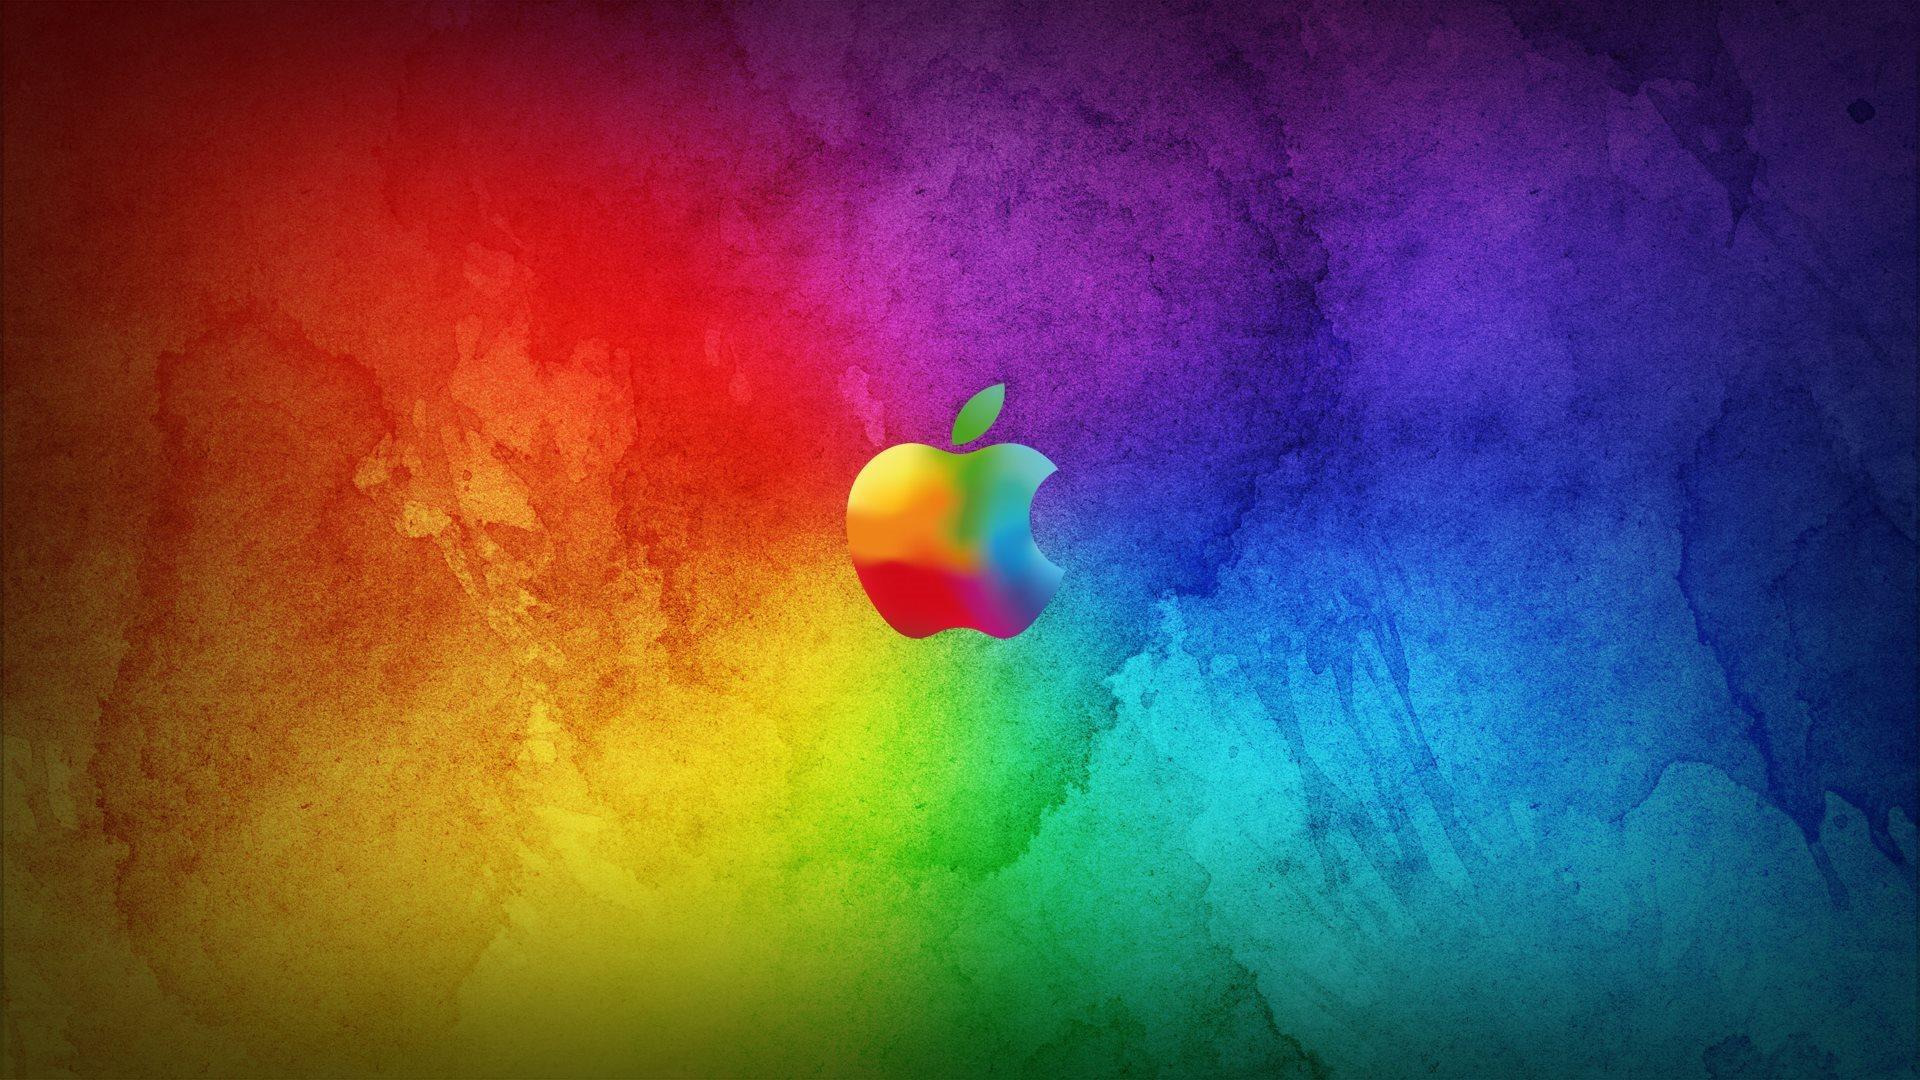 Apple Logo Wallpapers Desktop HD Wallpaper of Logo   hdwallpaper2013 1920x1080